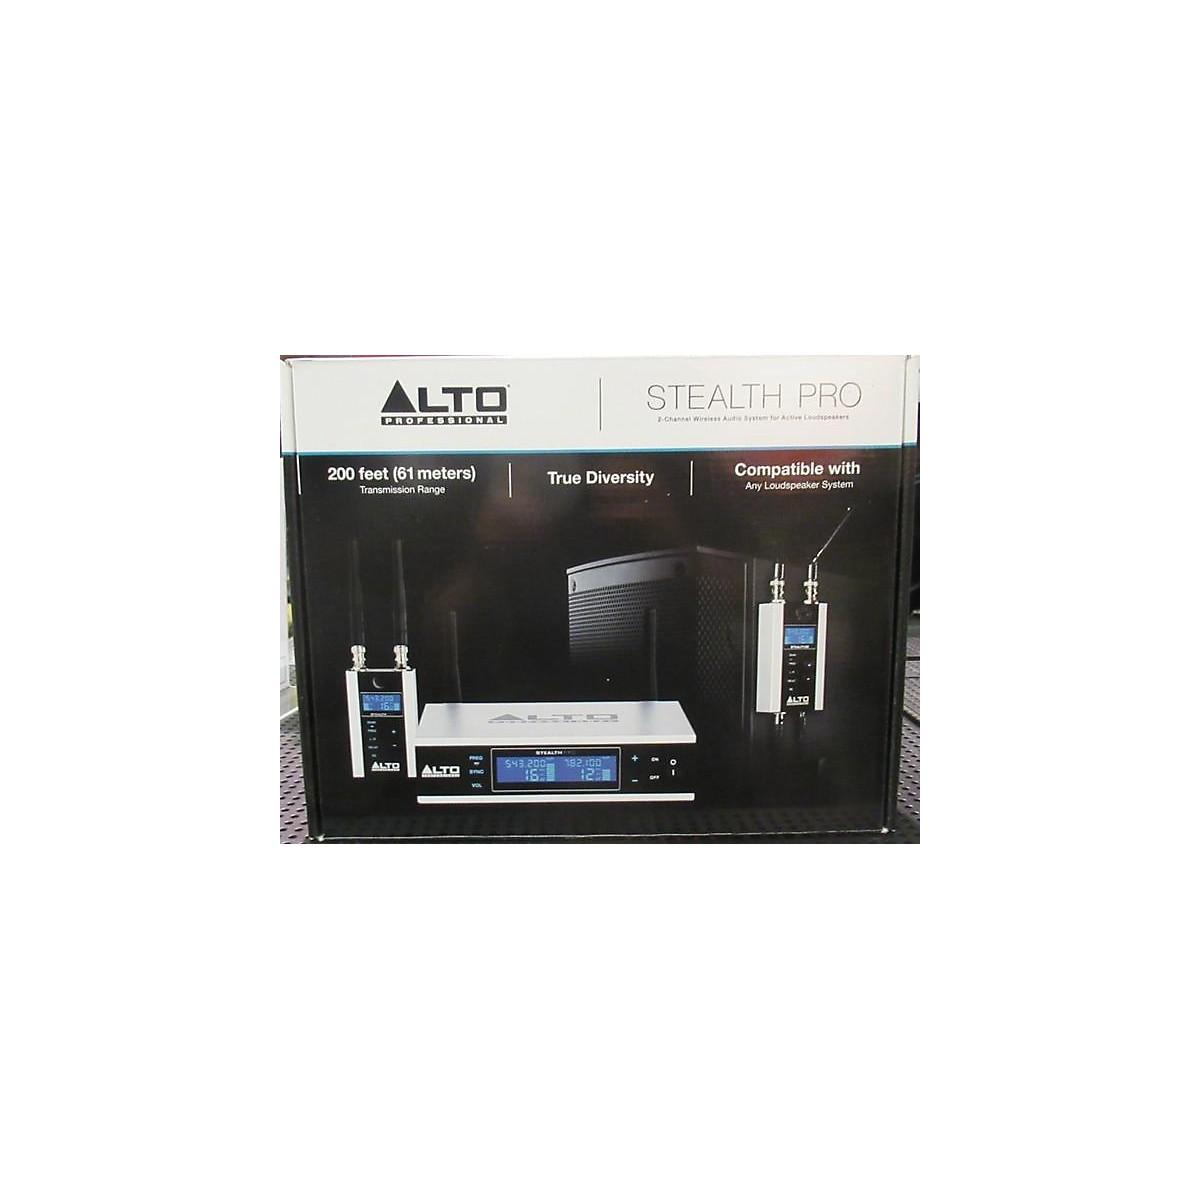 Alto Stealth Pro Wireless System